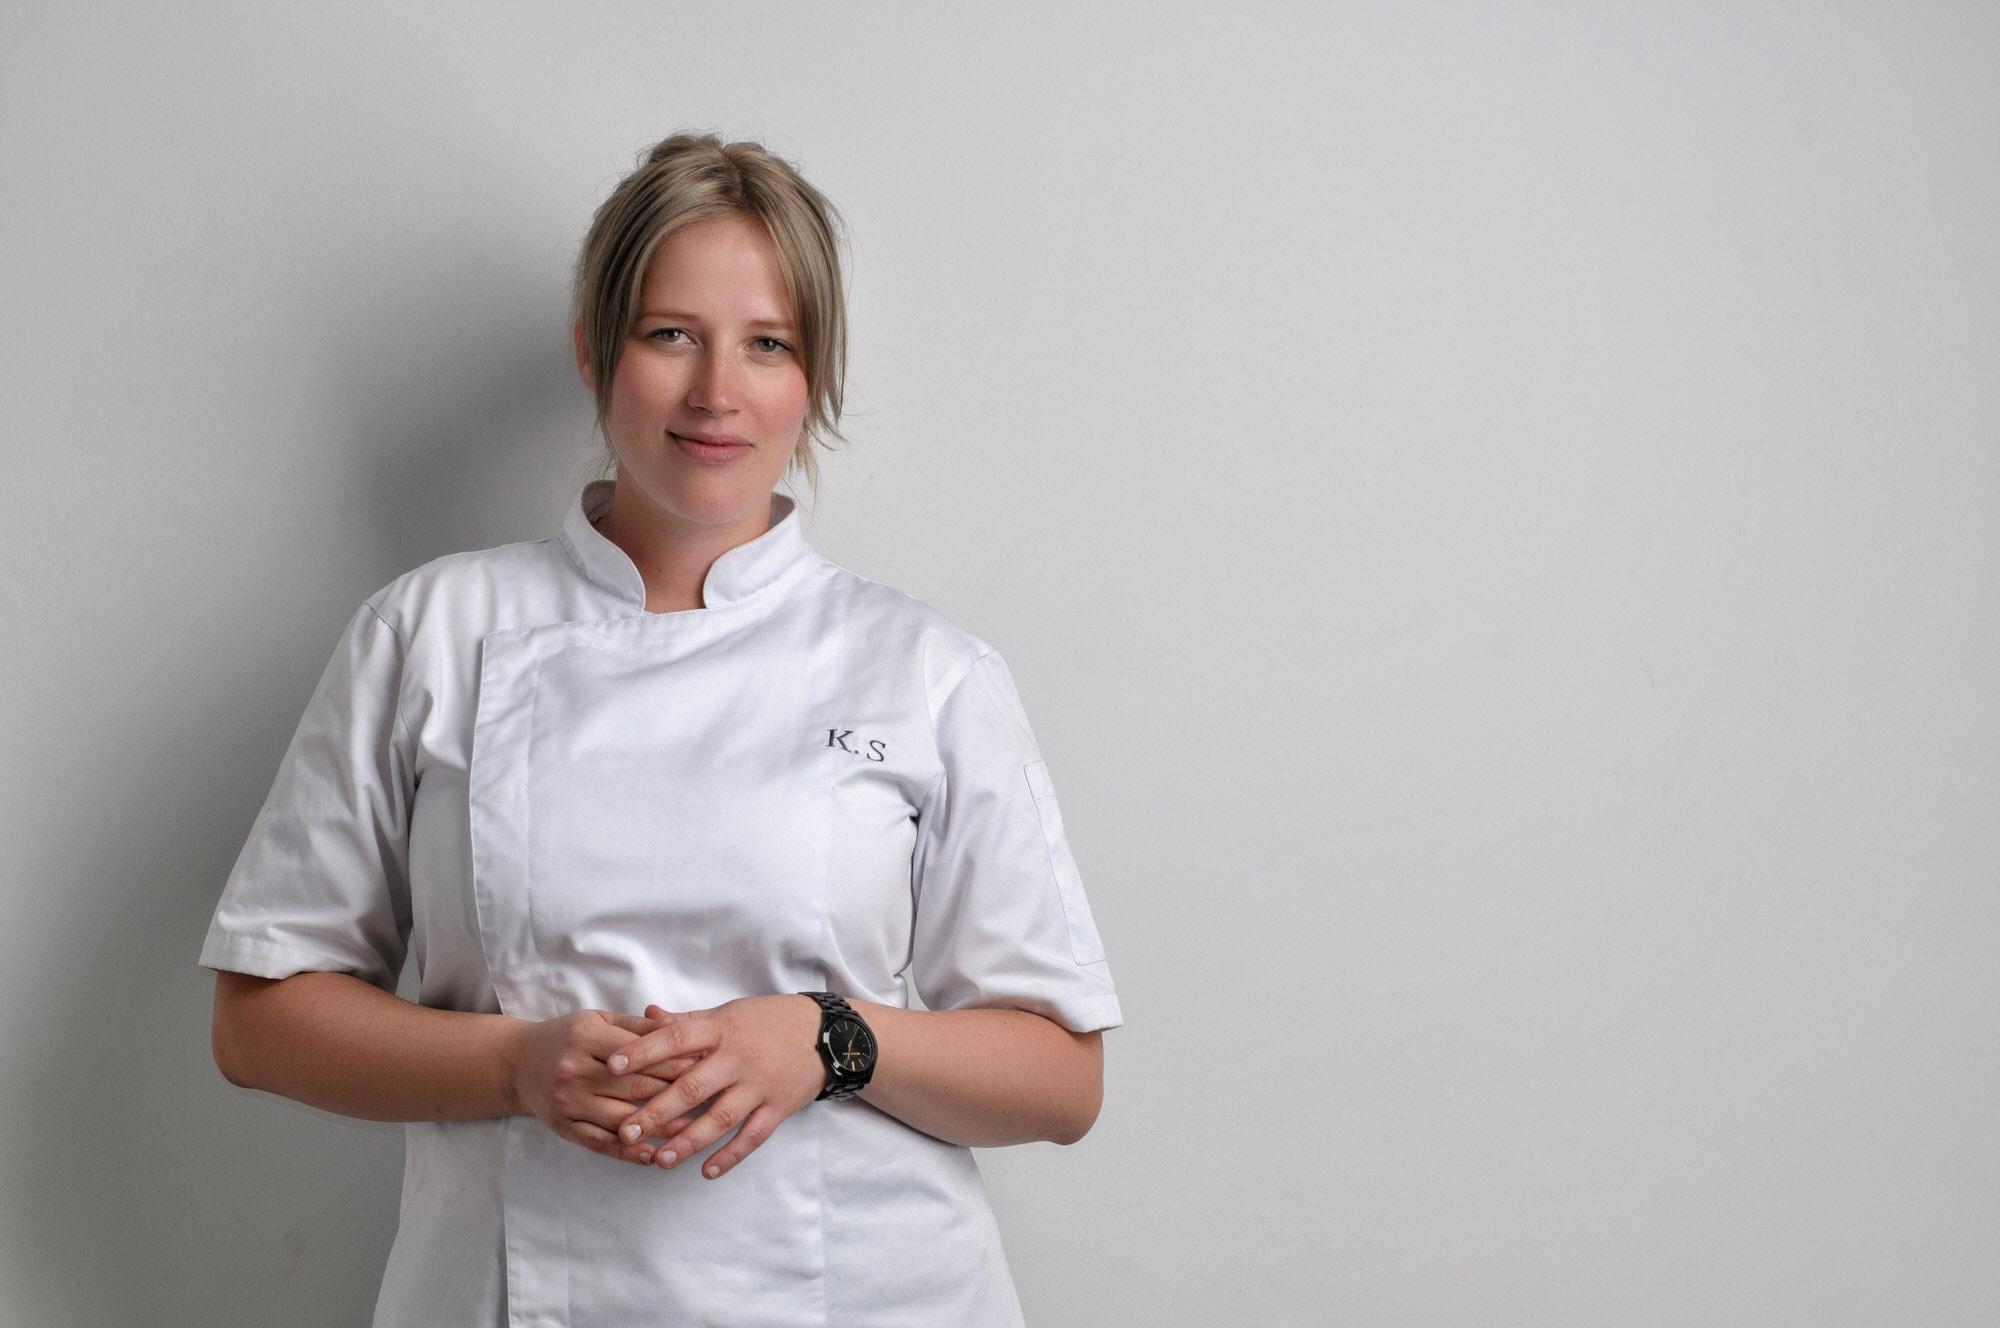 A portrait shot of Kamilla Seidler in a white apron